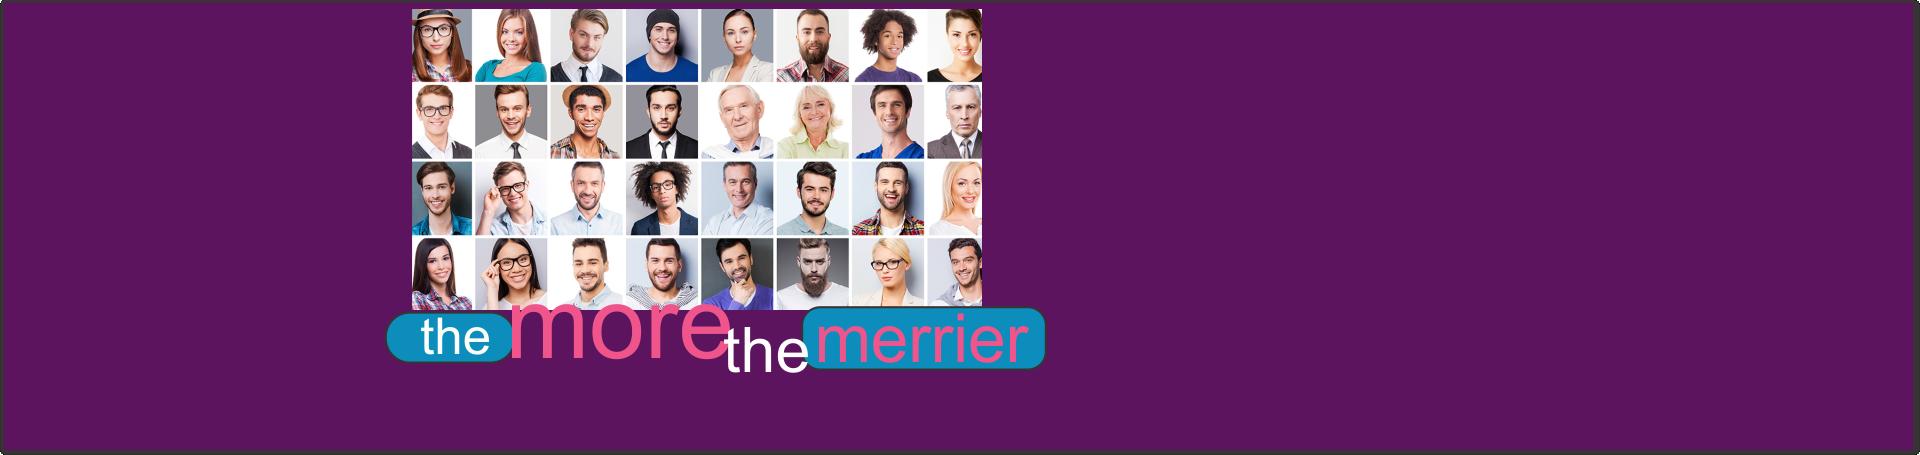 Membership, the more the merrier